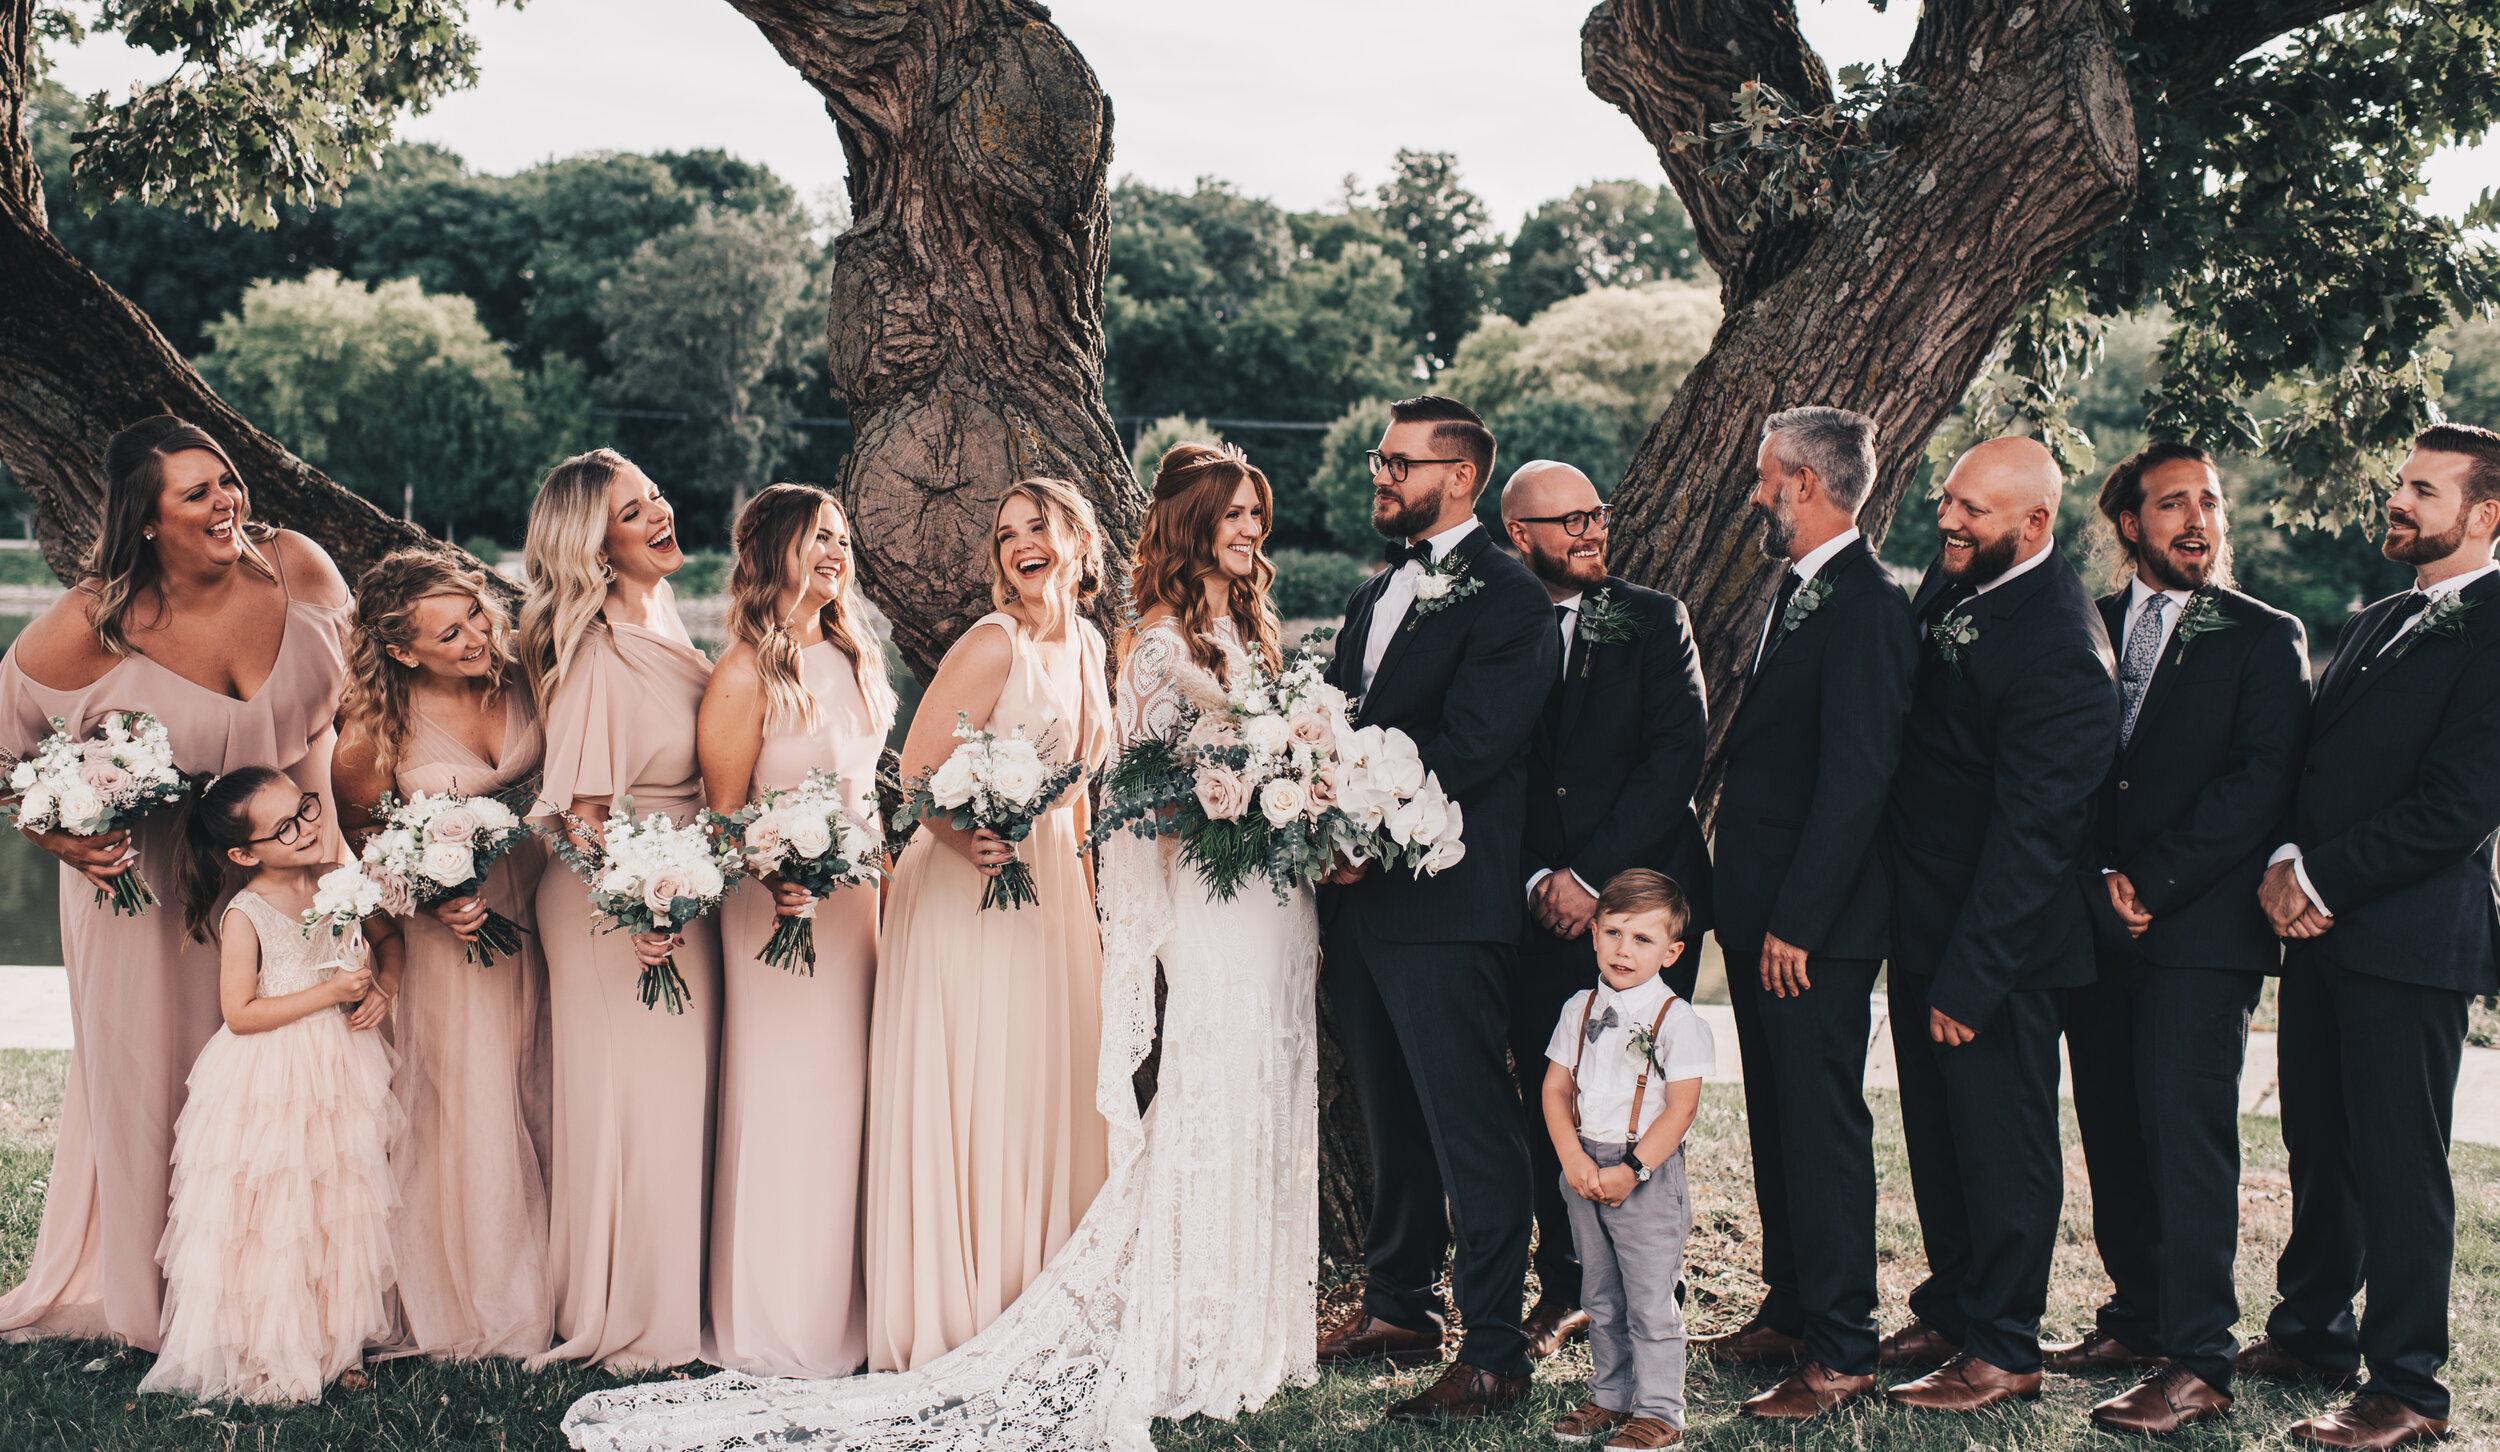 Modern Industrial Wedding, The Brix on the Fox, The BRIX, Chicago Industrial Wedding, Modern Midwest Wedding, The Brix on the Fox Wedding, The BRIX Wedding, Outdoor Boho Wedding Photos